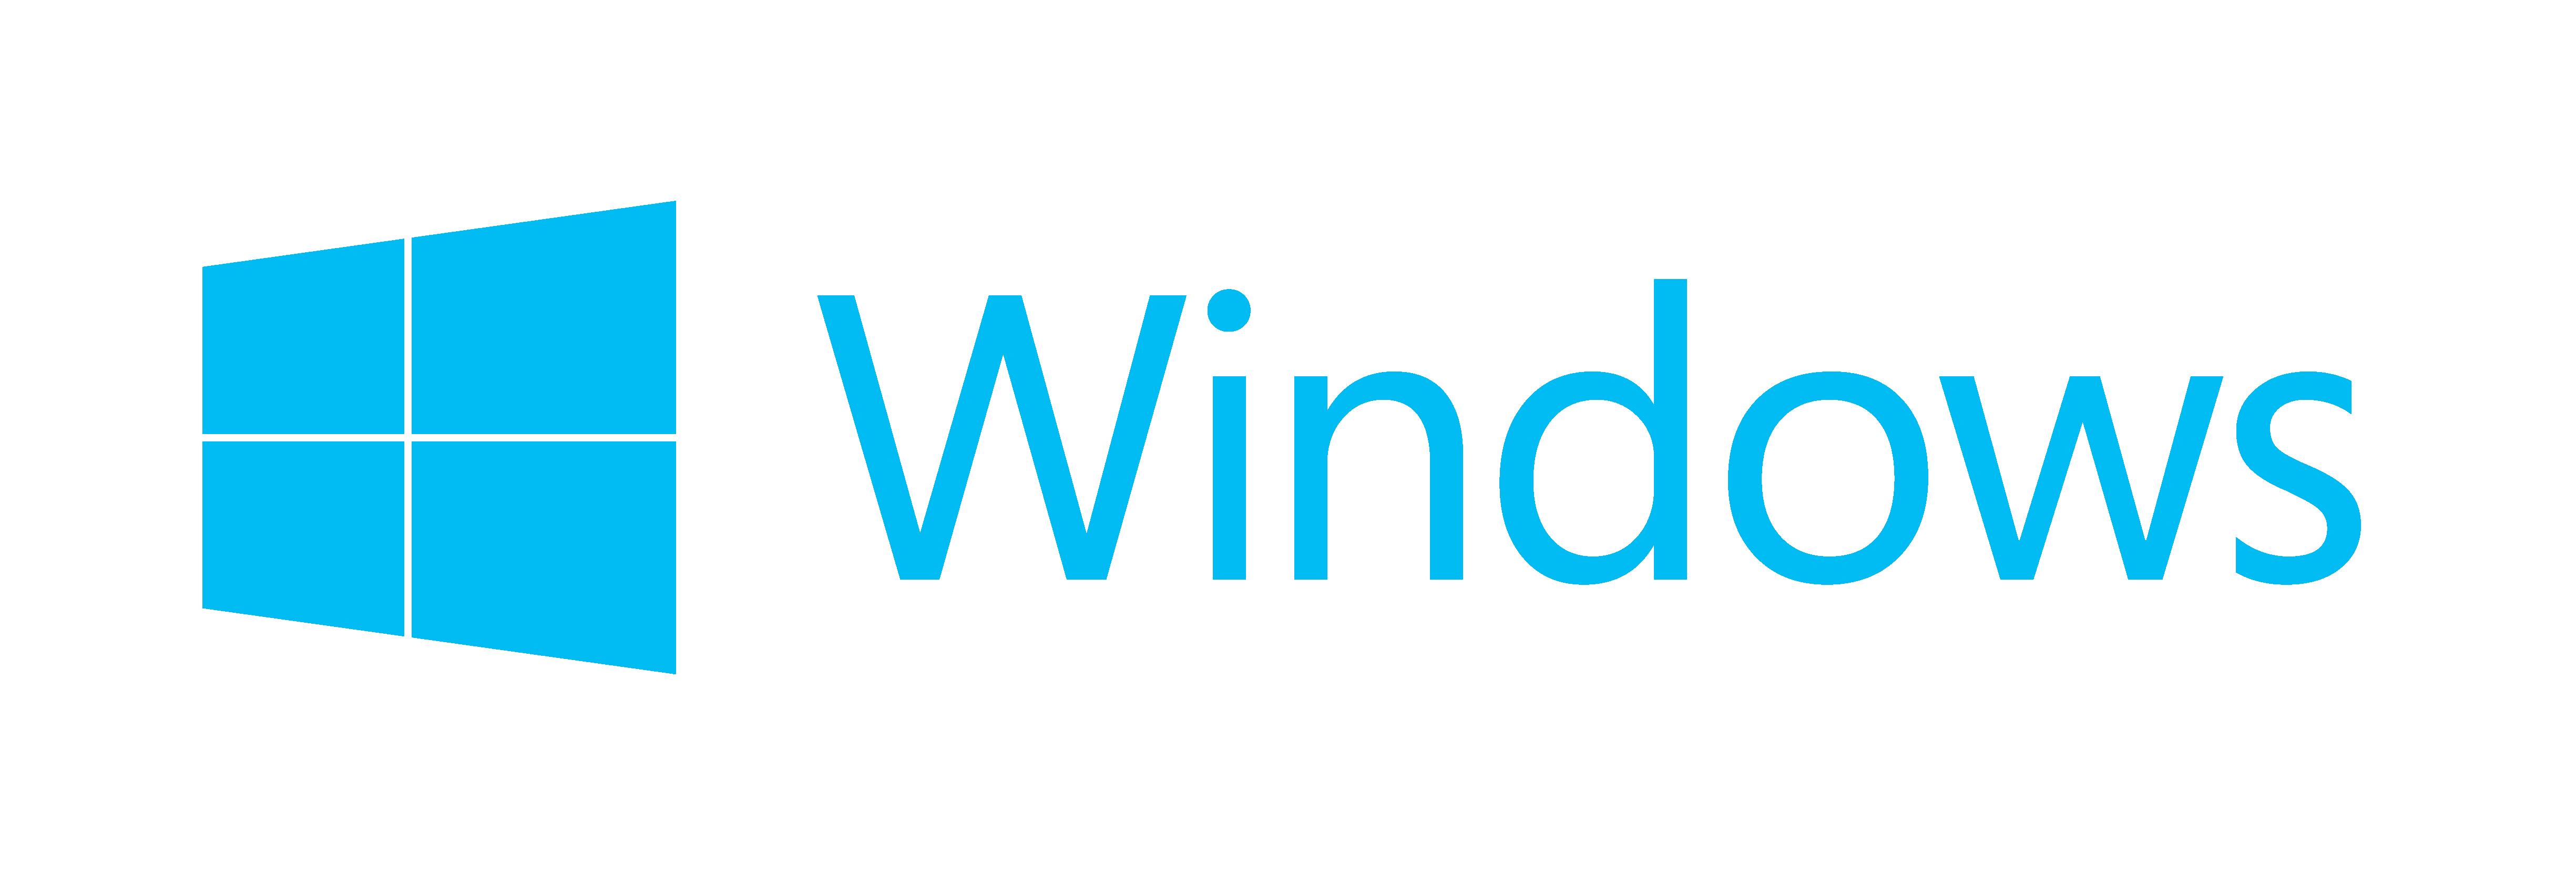 windows-logo-mygalaxy-view-singularlogic-6